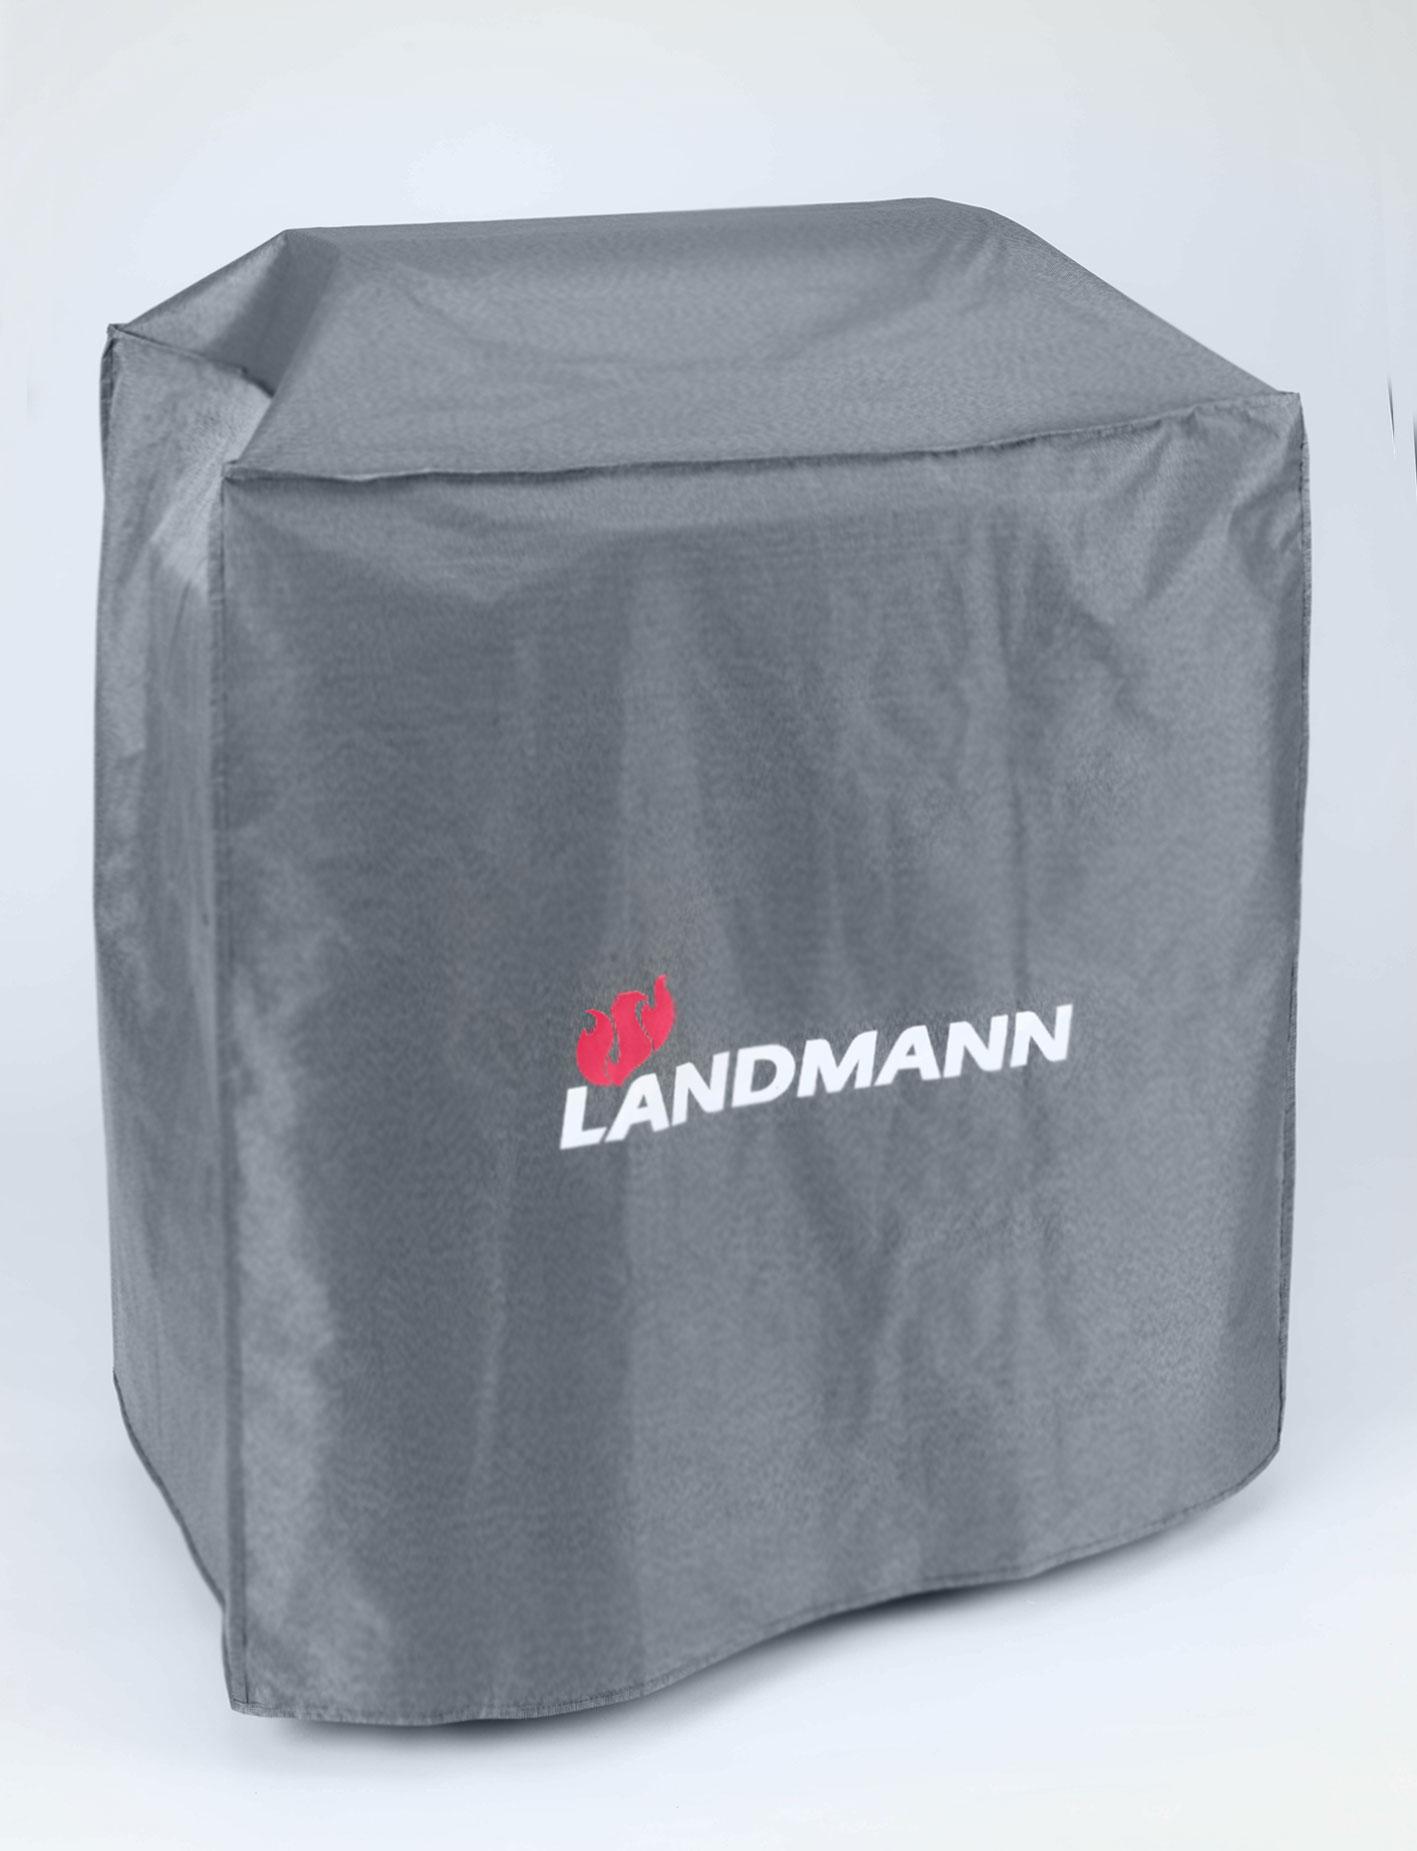 schutzh lle f r landmann grill wetterschutzhaube premium l. Black Bedroom Furniture Sets. Home Design Ideas